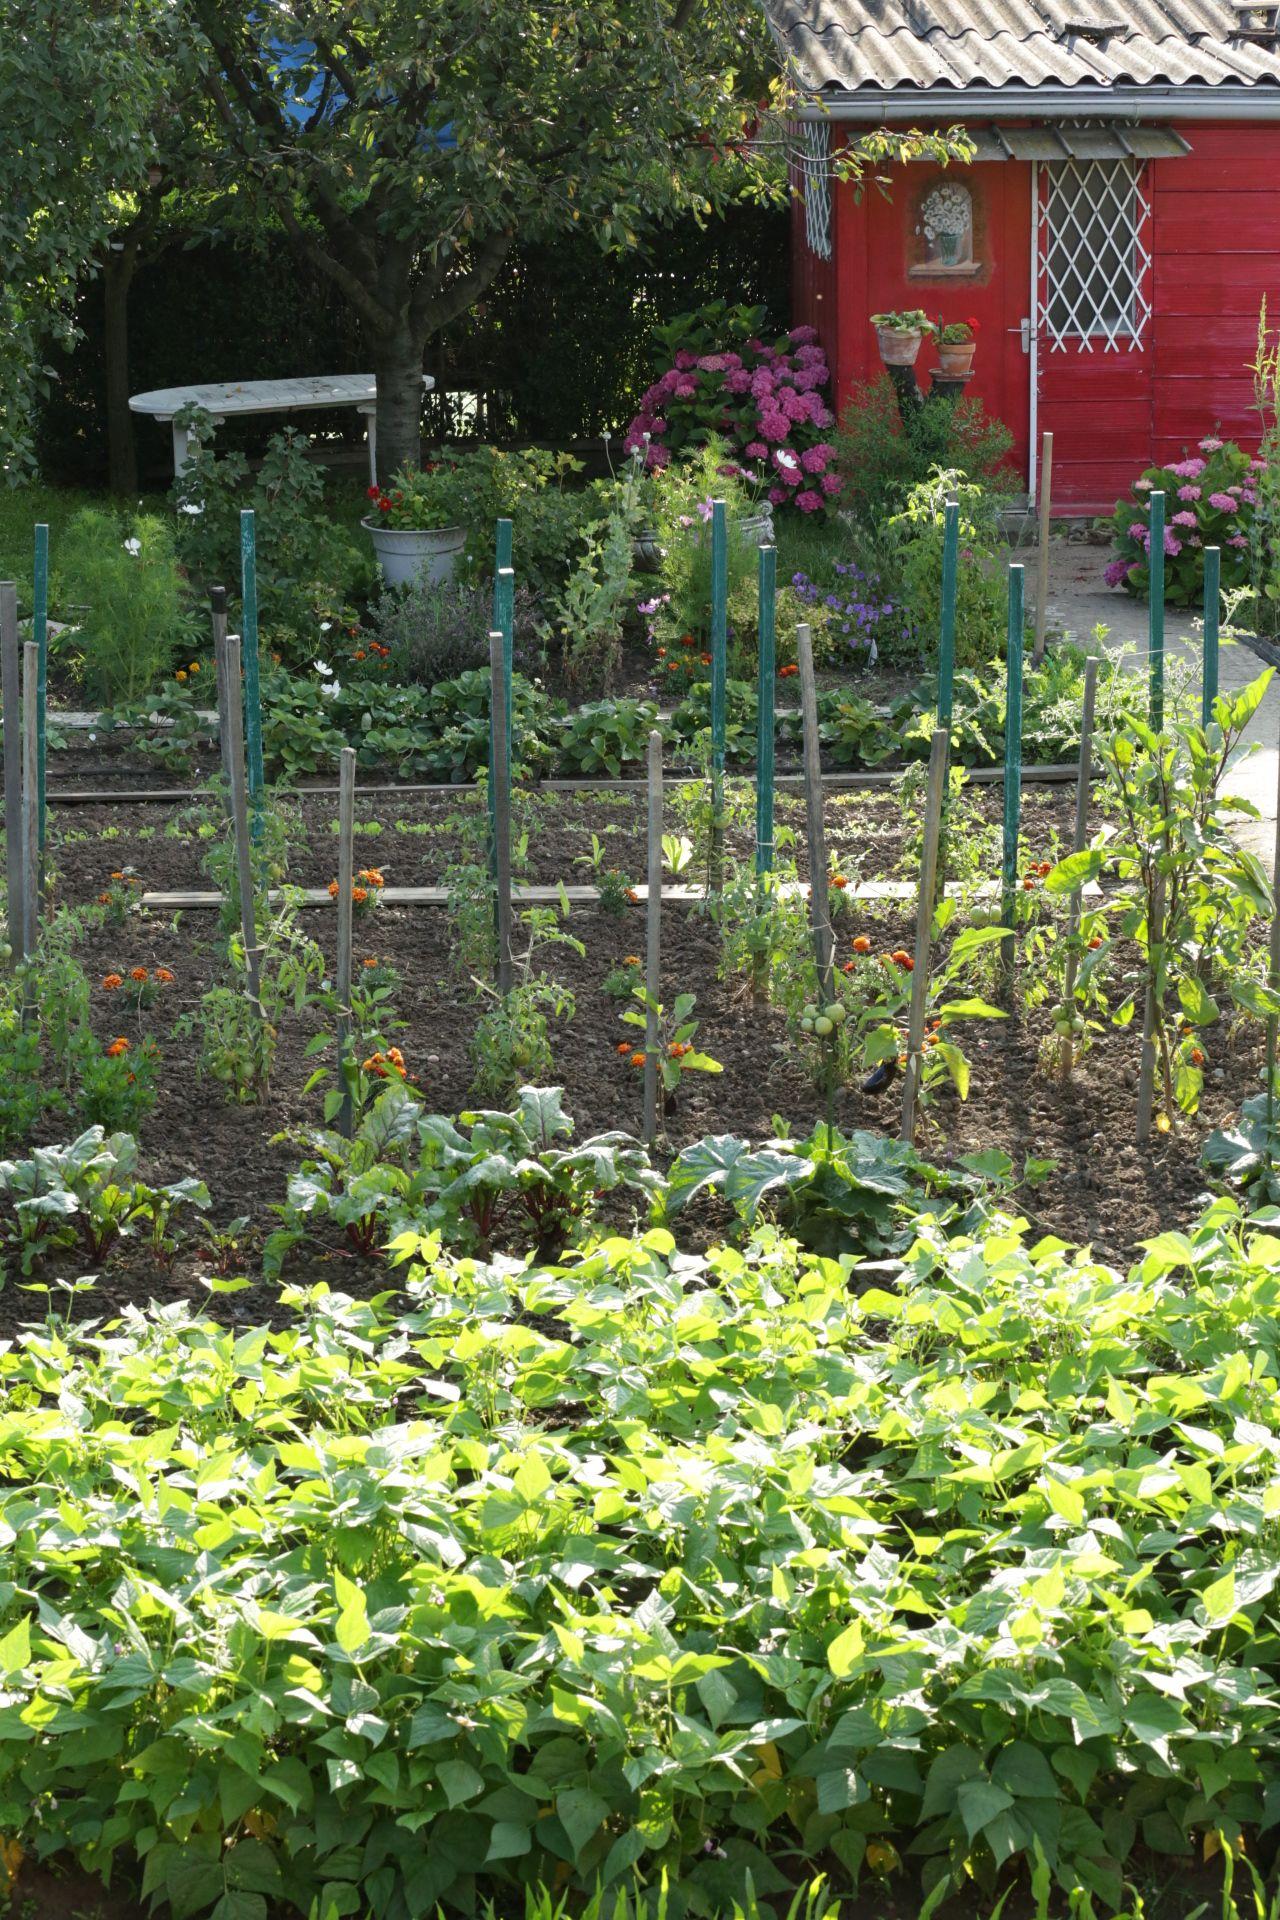 le potager gourmand botanic le potager gourmand pinterest potager jardinage potager et. Black Bedroom Furniture Sets. Home Design Ideas